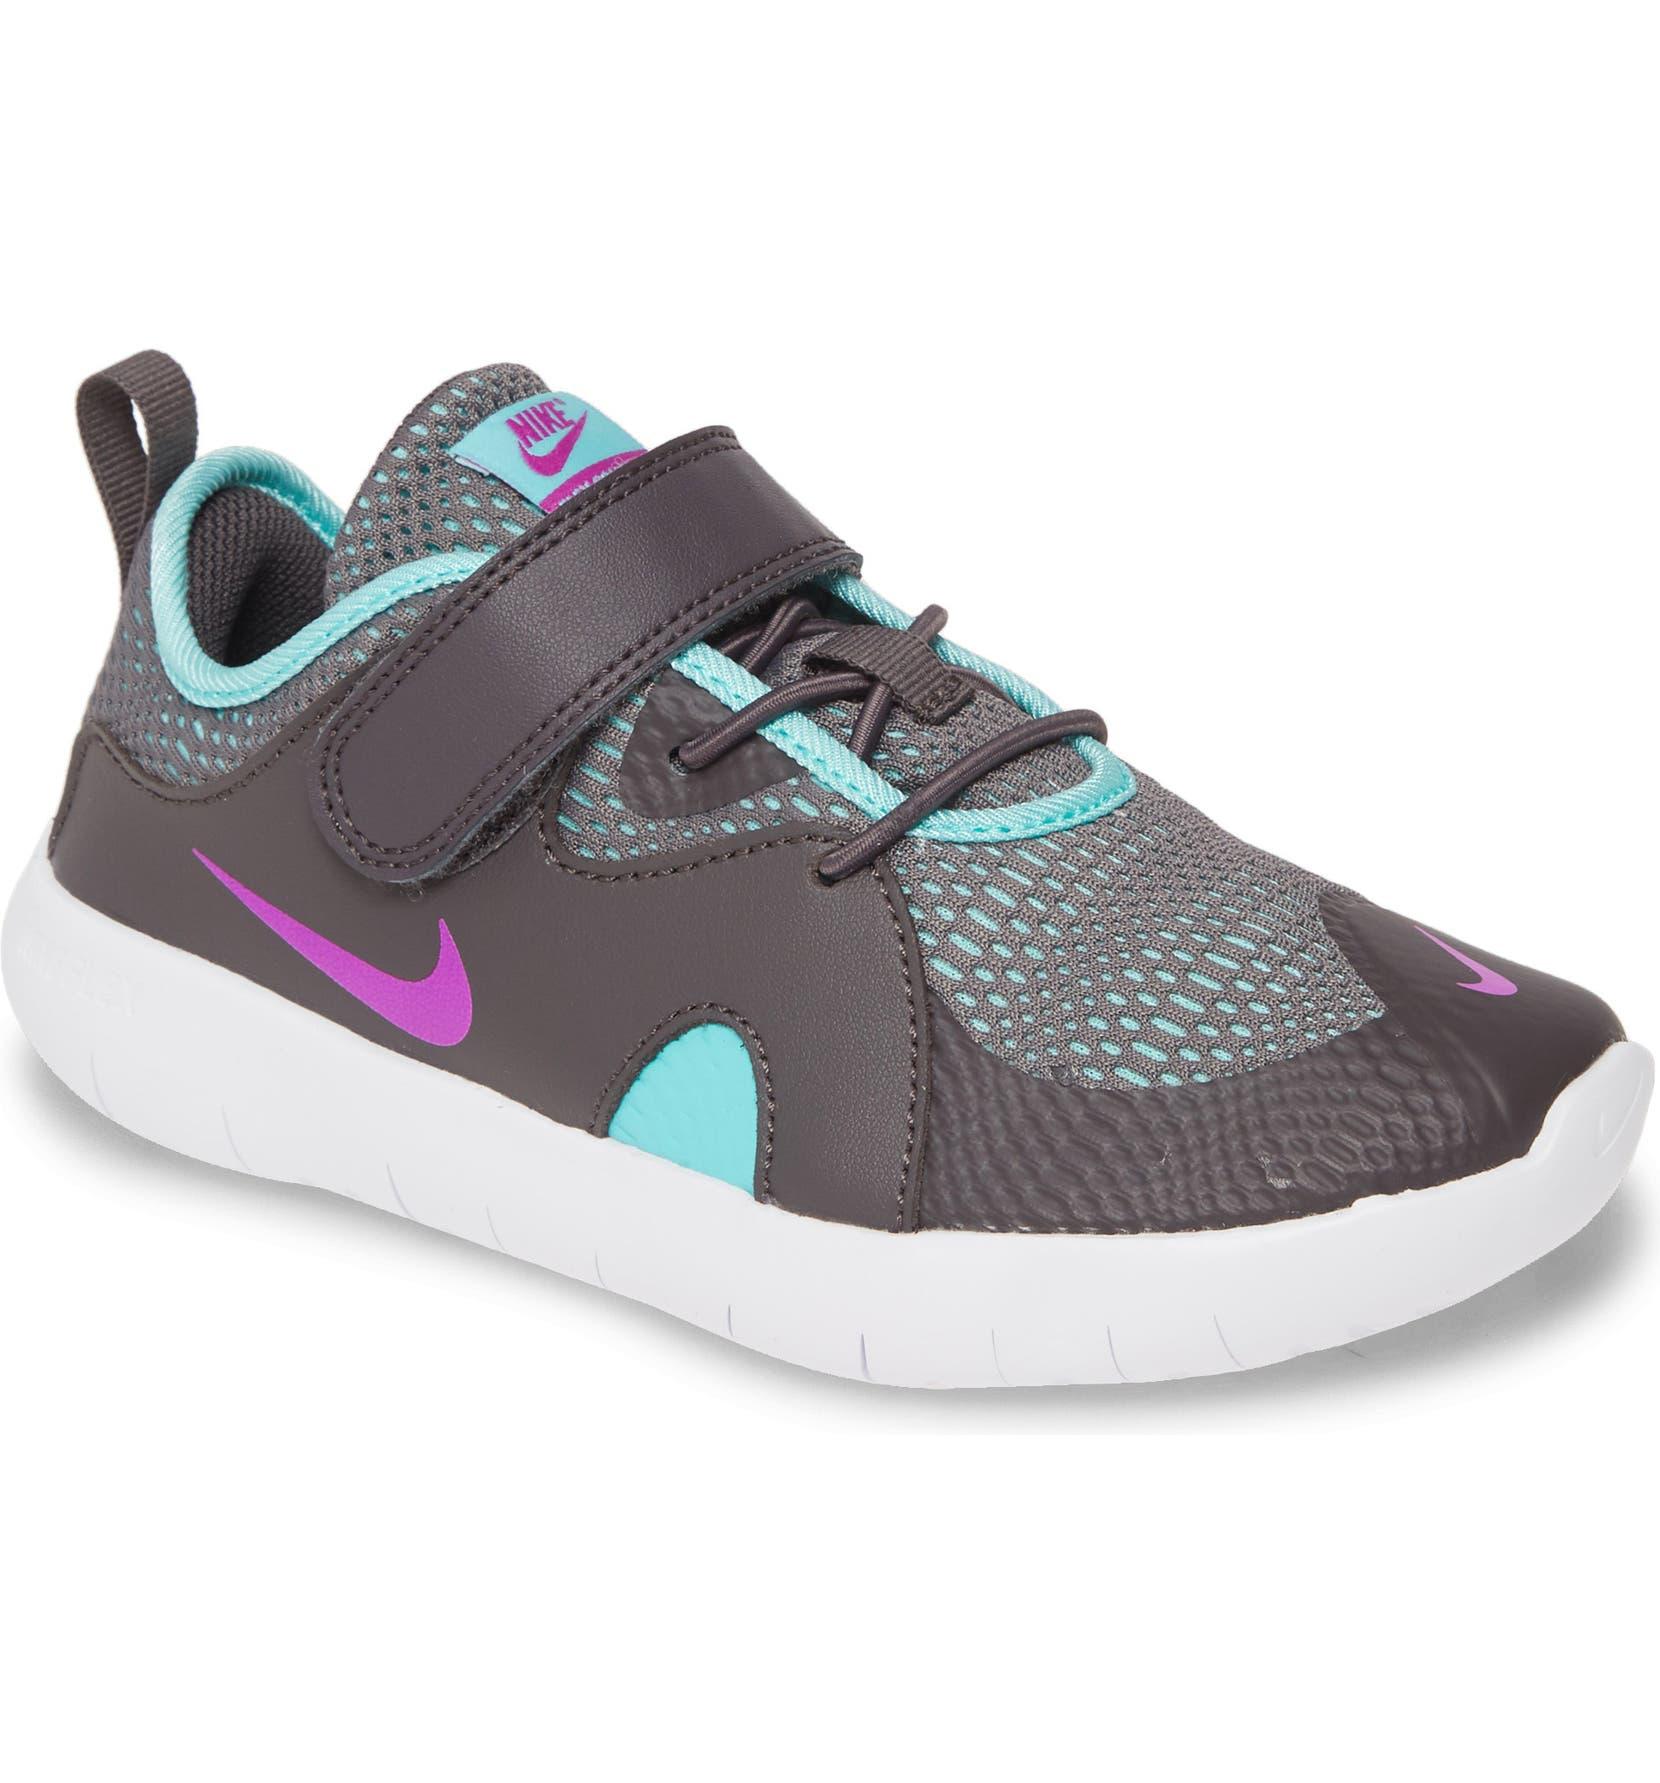 NIKE Flex Contact 3 PSV Running Shoe, Main, color, THUNDER GREY/ HYPER V